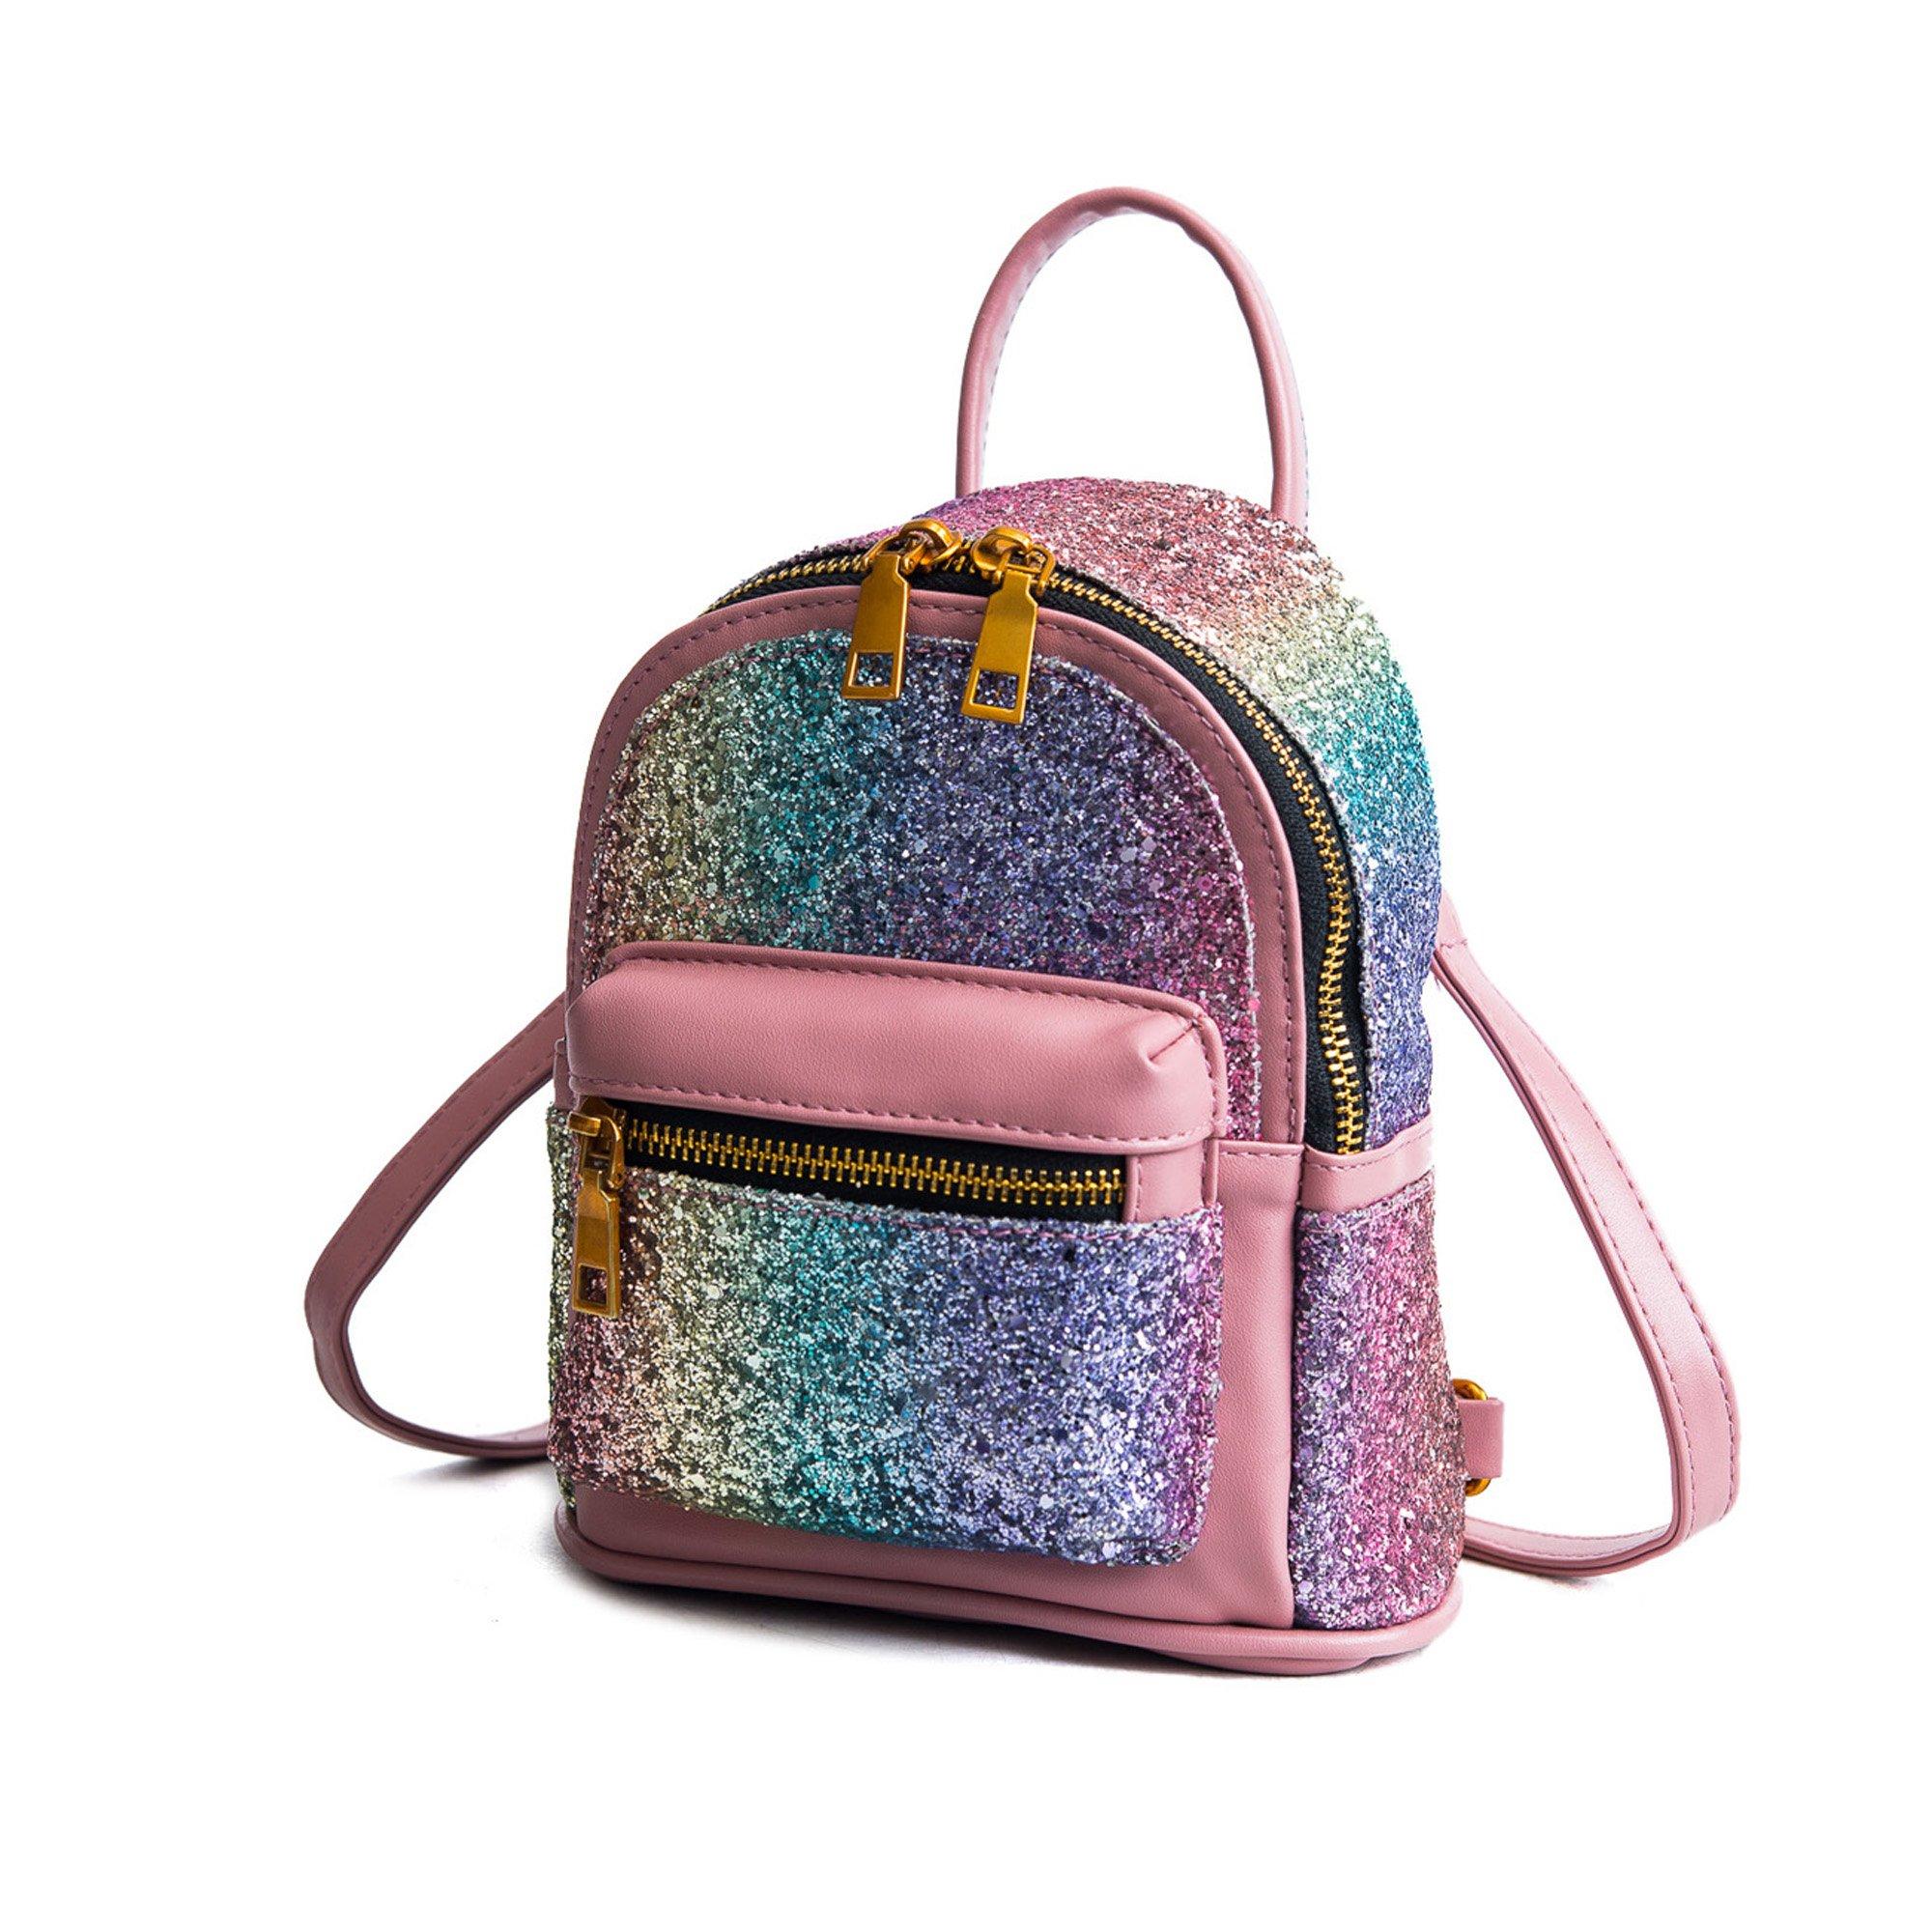 Girls Bling Mini Travel Backpack Kids Children School Bags Satchel Purses Daypack (pink rainbow) by JIANBAO (Image #2)